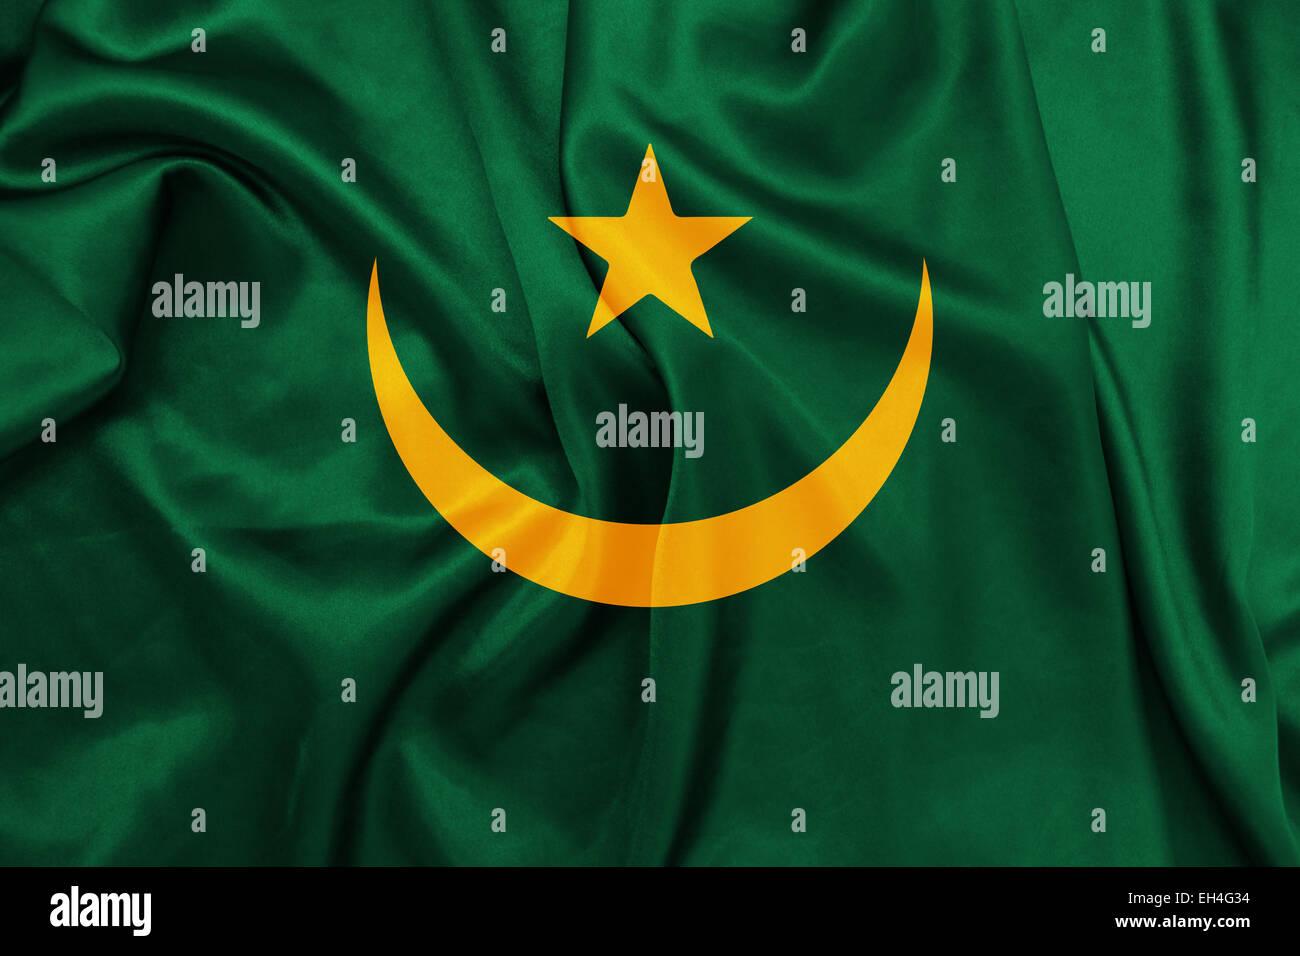 Mauritania - Waving national flag on silk texture - Stock Image